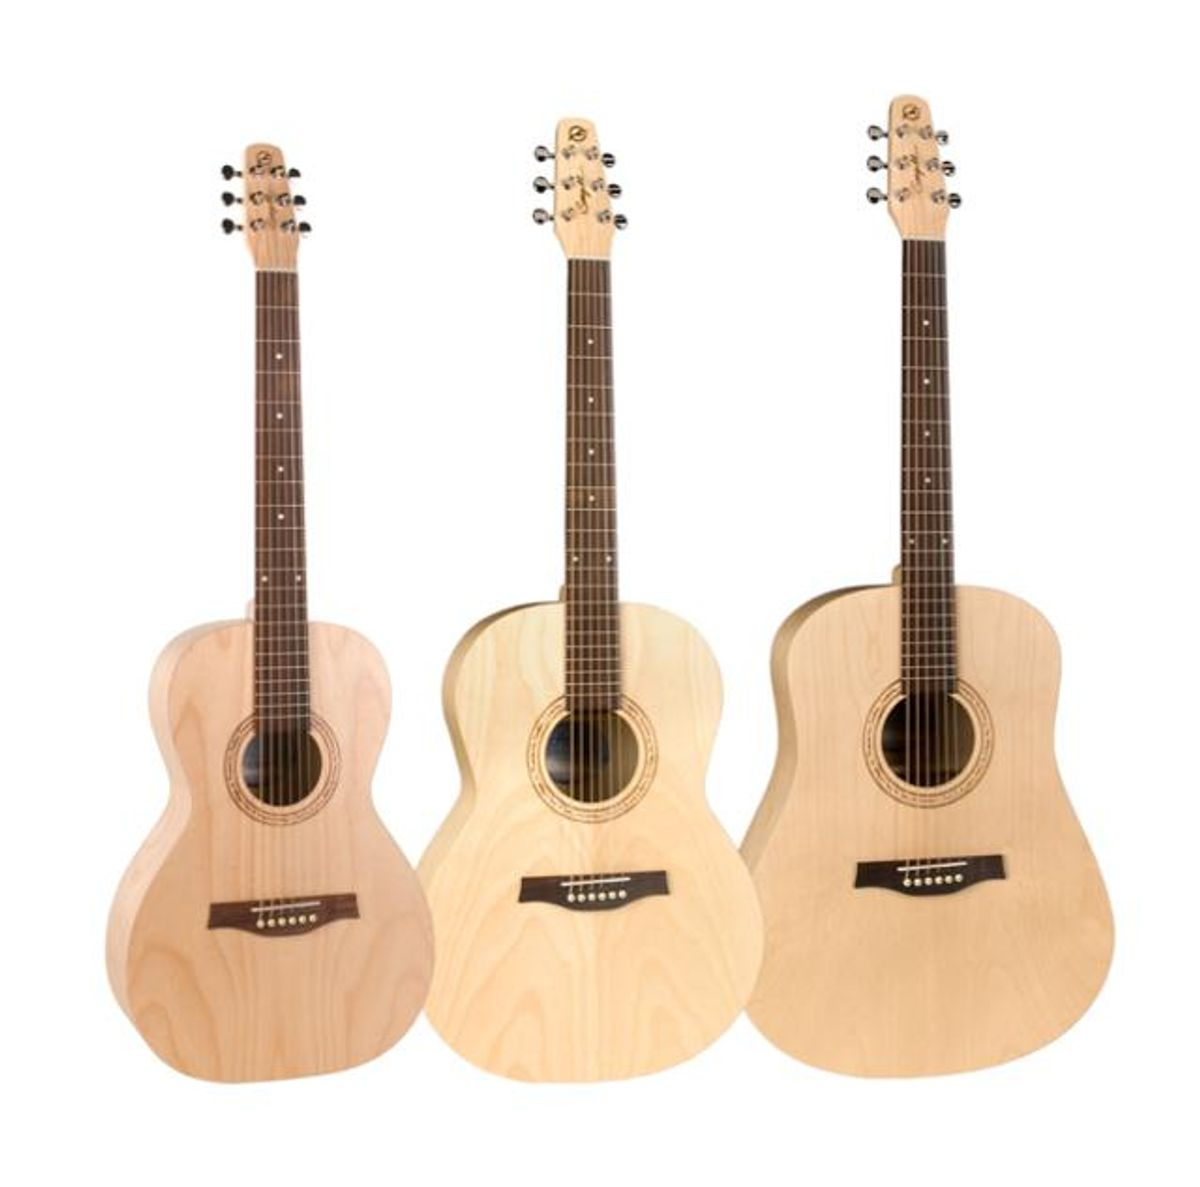 Seagull Guitars Announces New Excursion Series